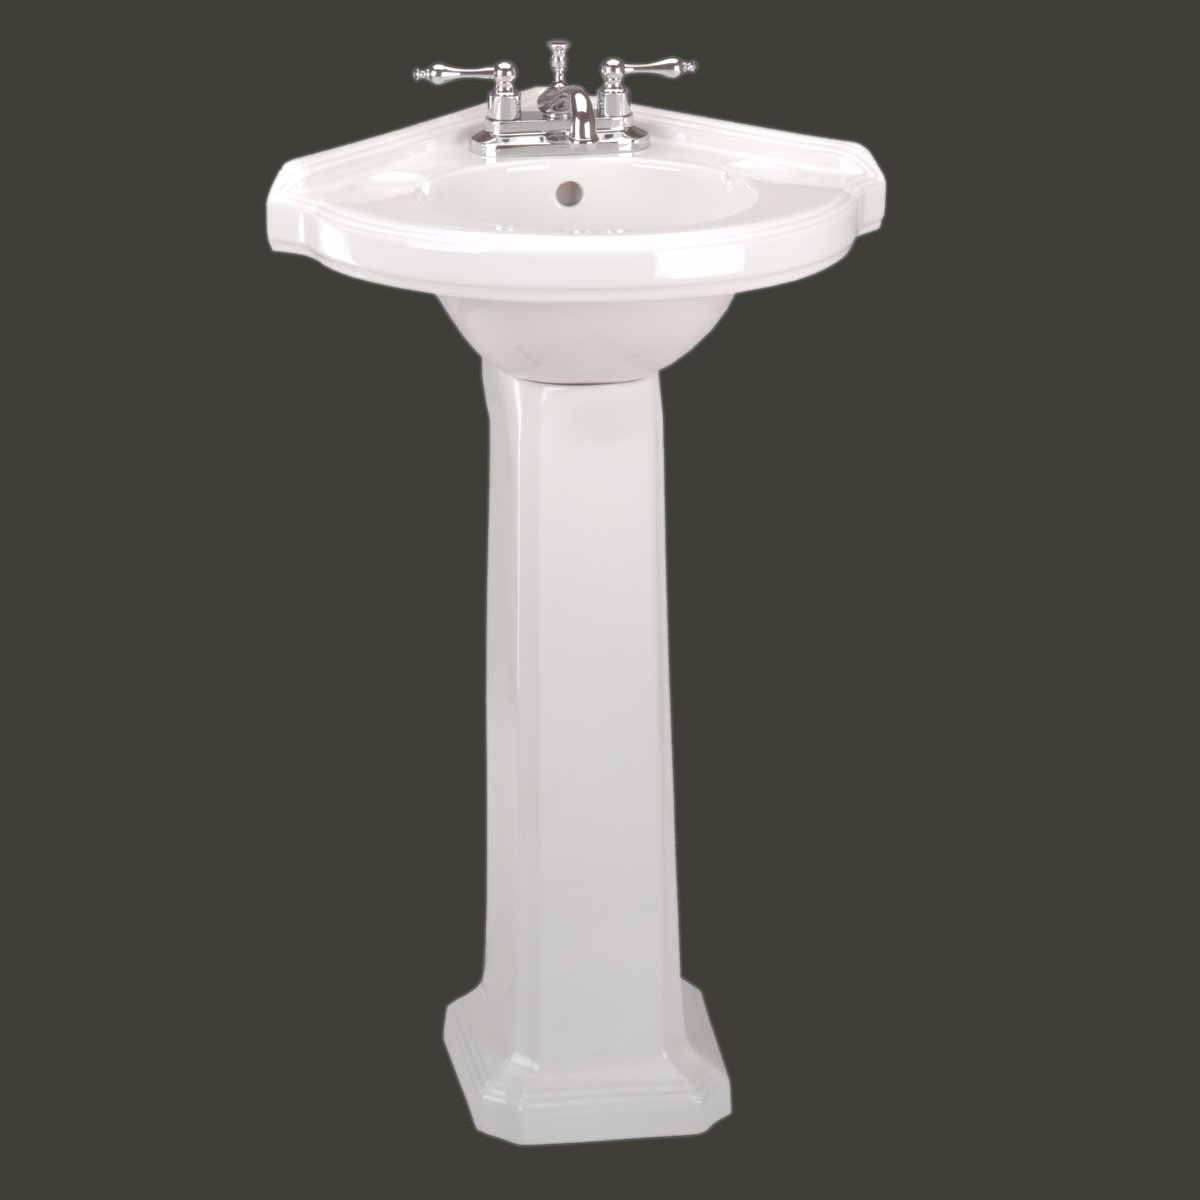 Robot Check Corner Pedestal Sink Pedestal Sink Corner Sink